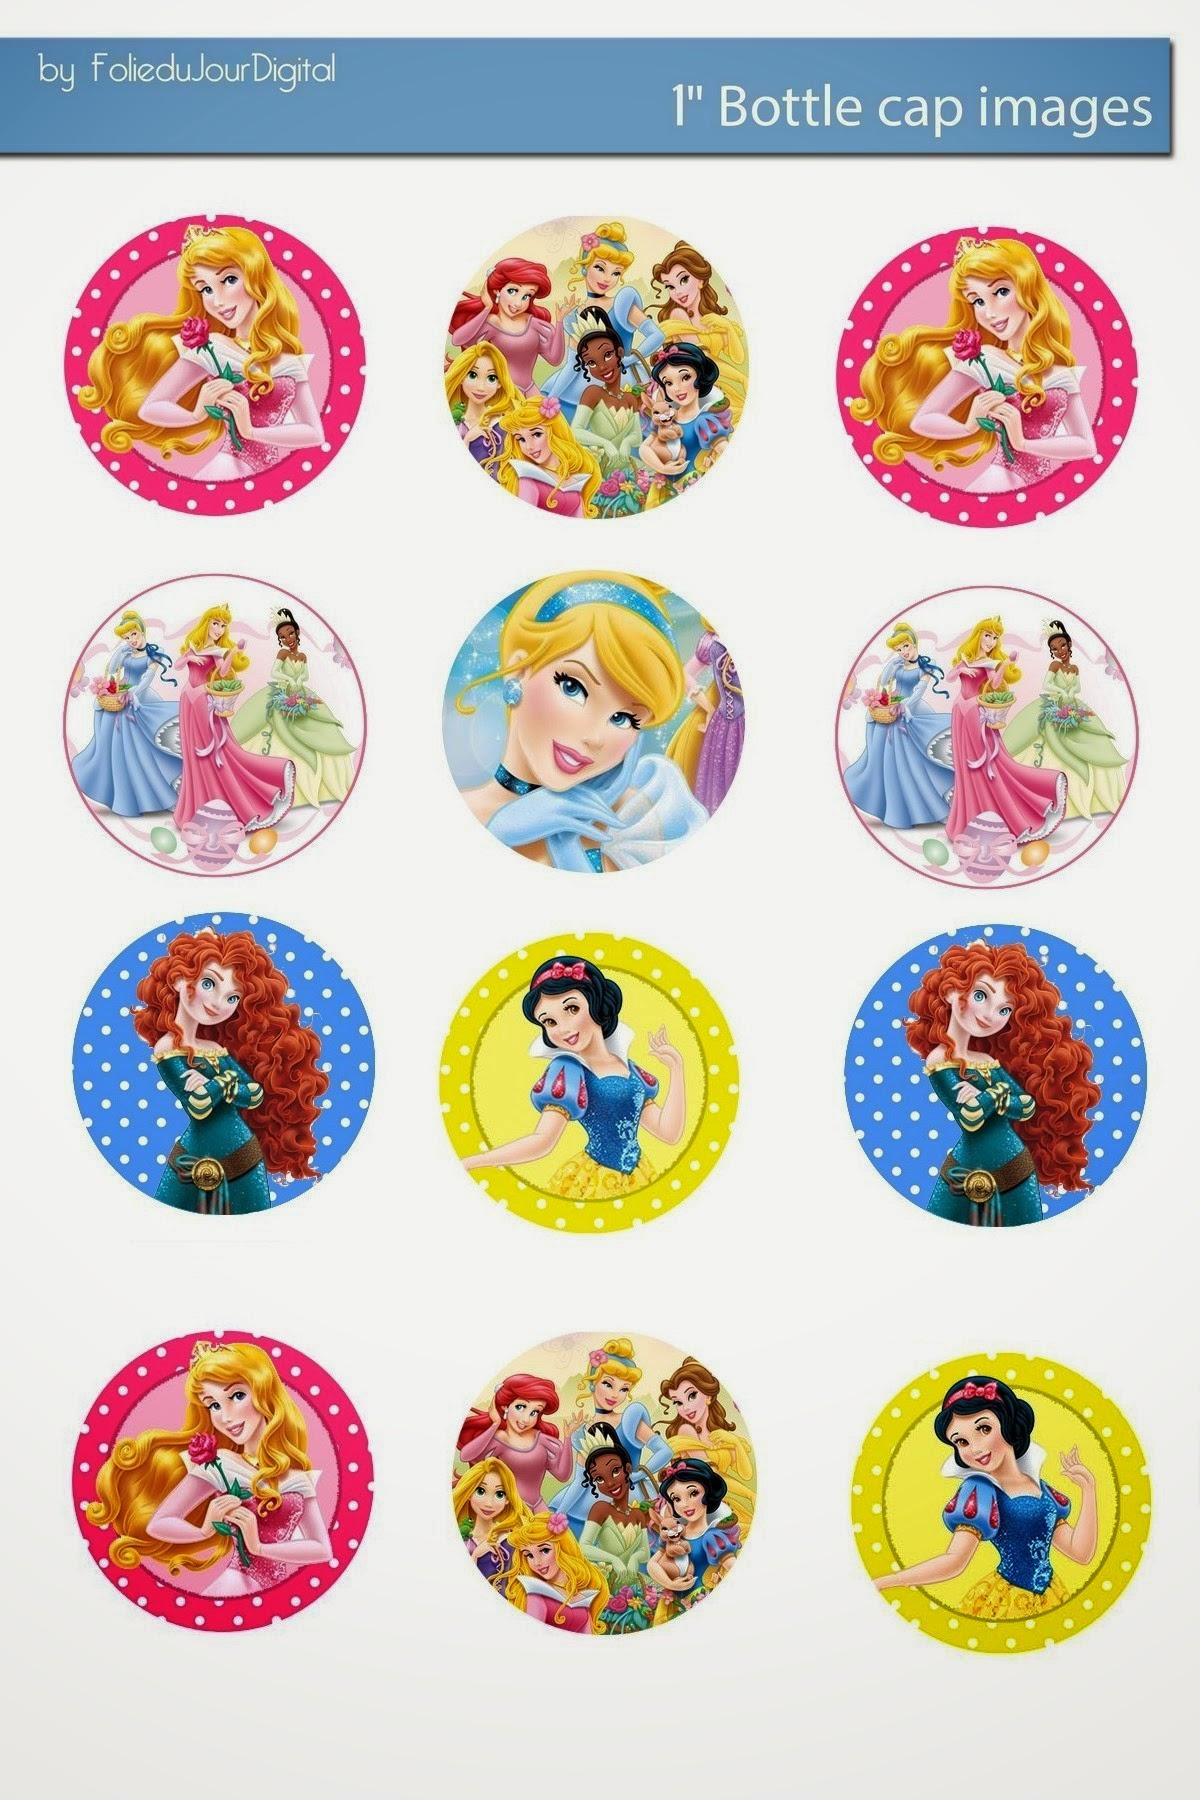 Free Bottle Cap Images Disney Princess 1 Inch Free